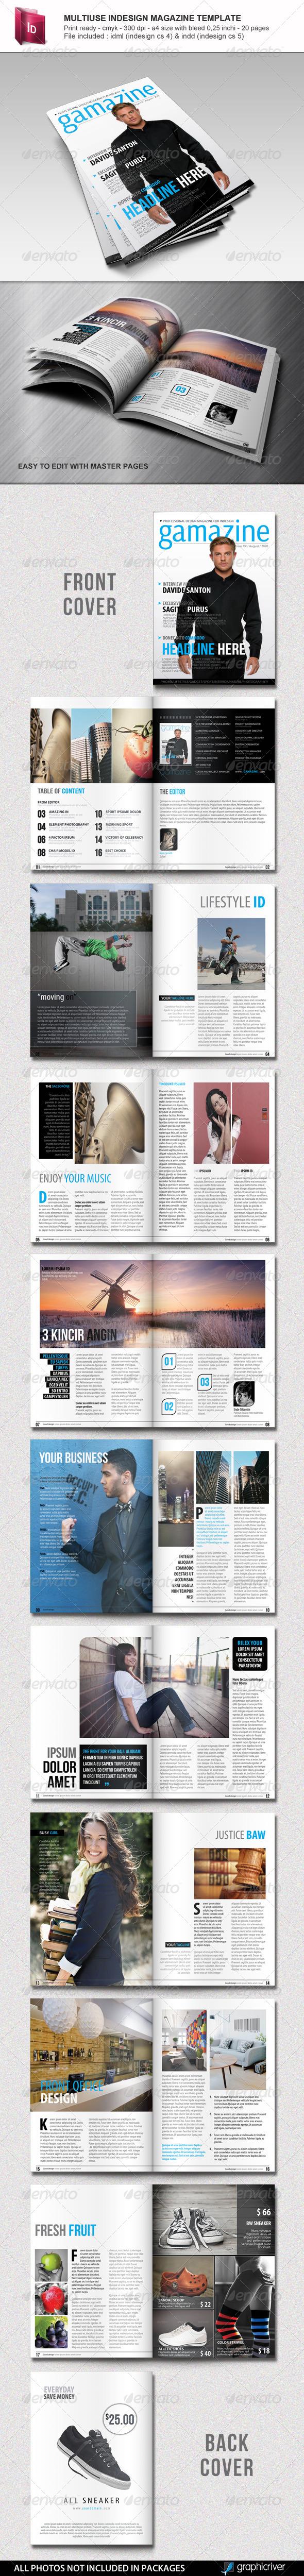 GraphicRiver Multiuse Indesign Magazine Template 4421136